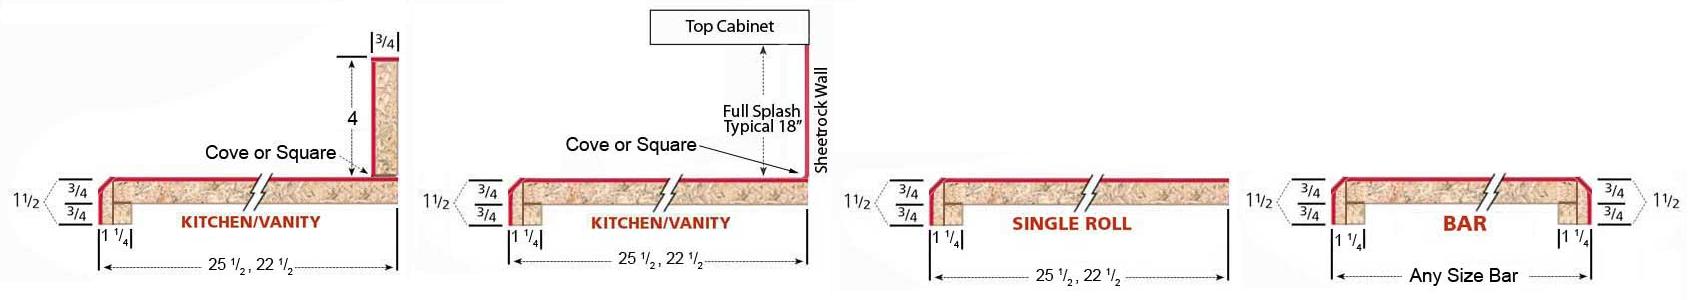 LC Bevel Kitchen, Vanity, and Bar Specs - Laminate Countertops